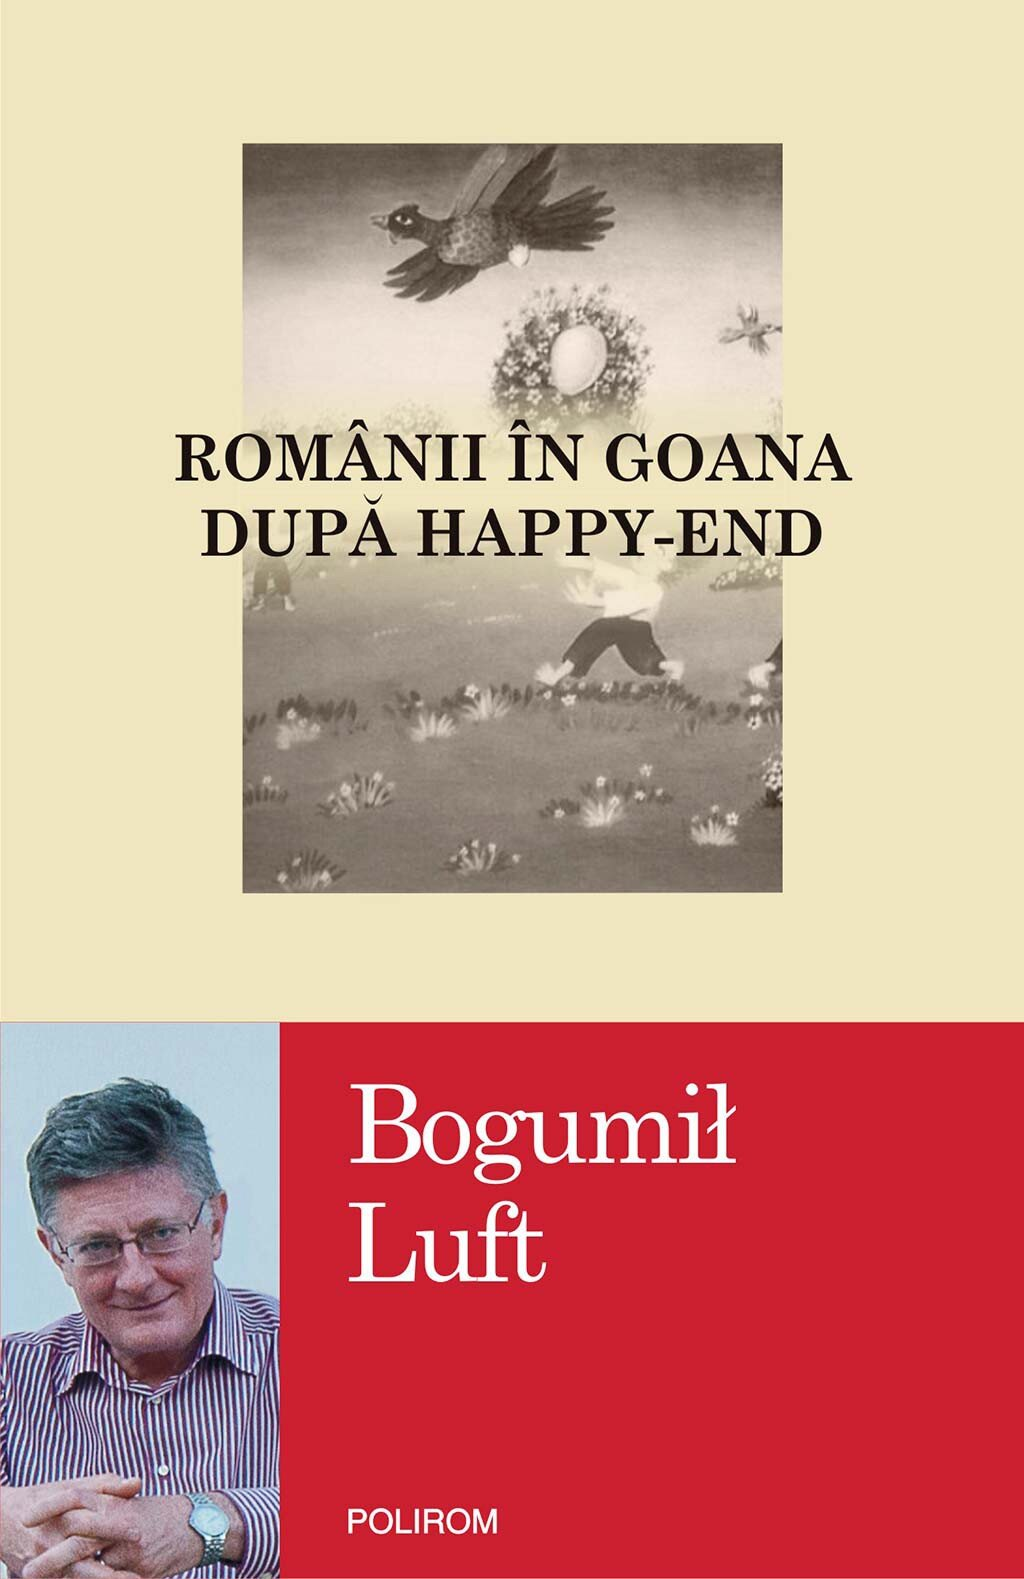 Romanii in goana dupa happy-end PDF (Download eBook)